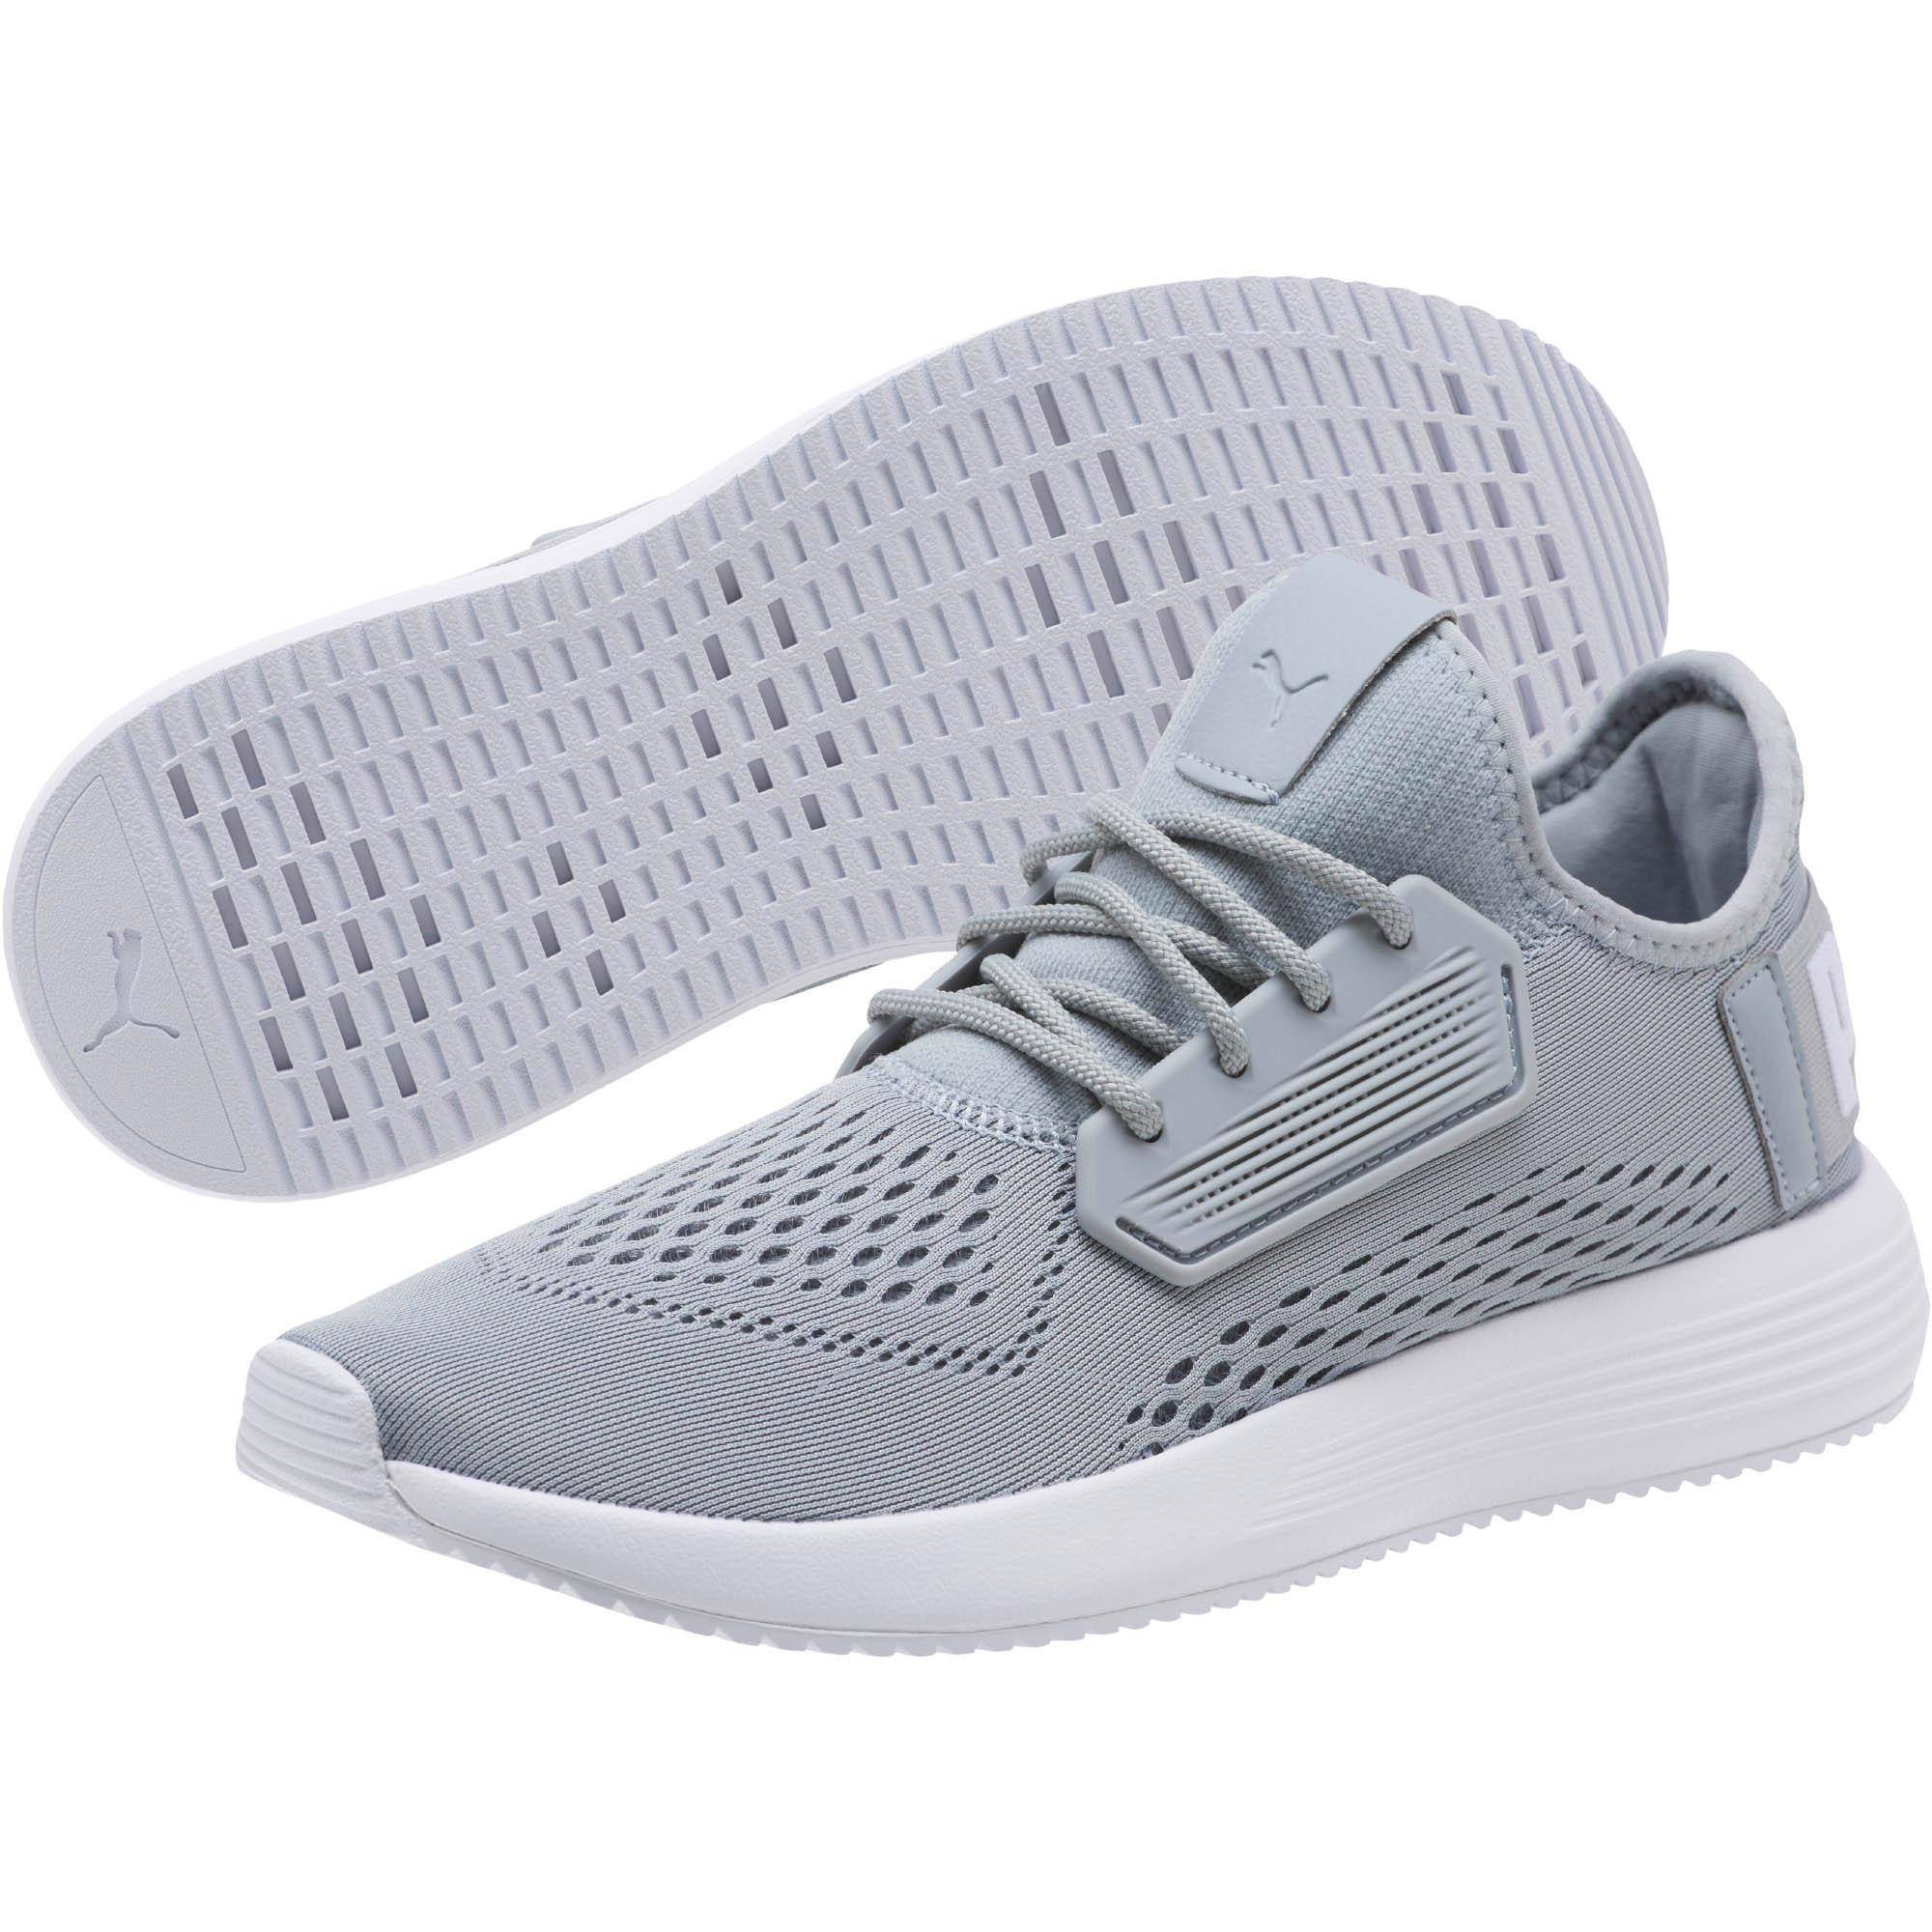 bc4d5d53c453ee PUMA - White Uprise Mesh Men s Sneakers for Men - Lyst. View fullscreen